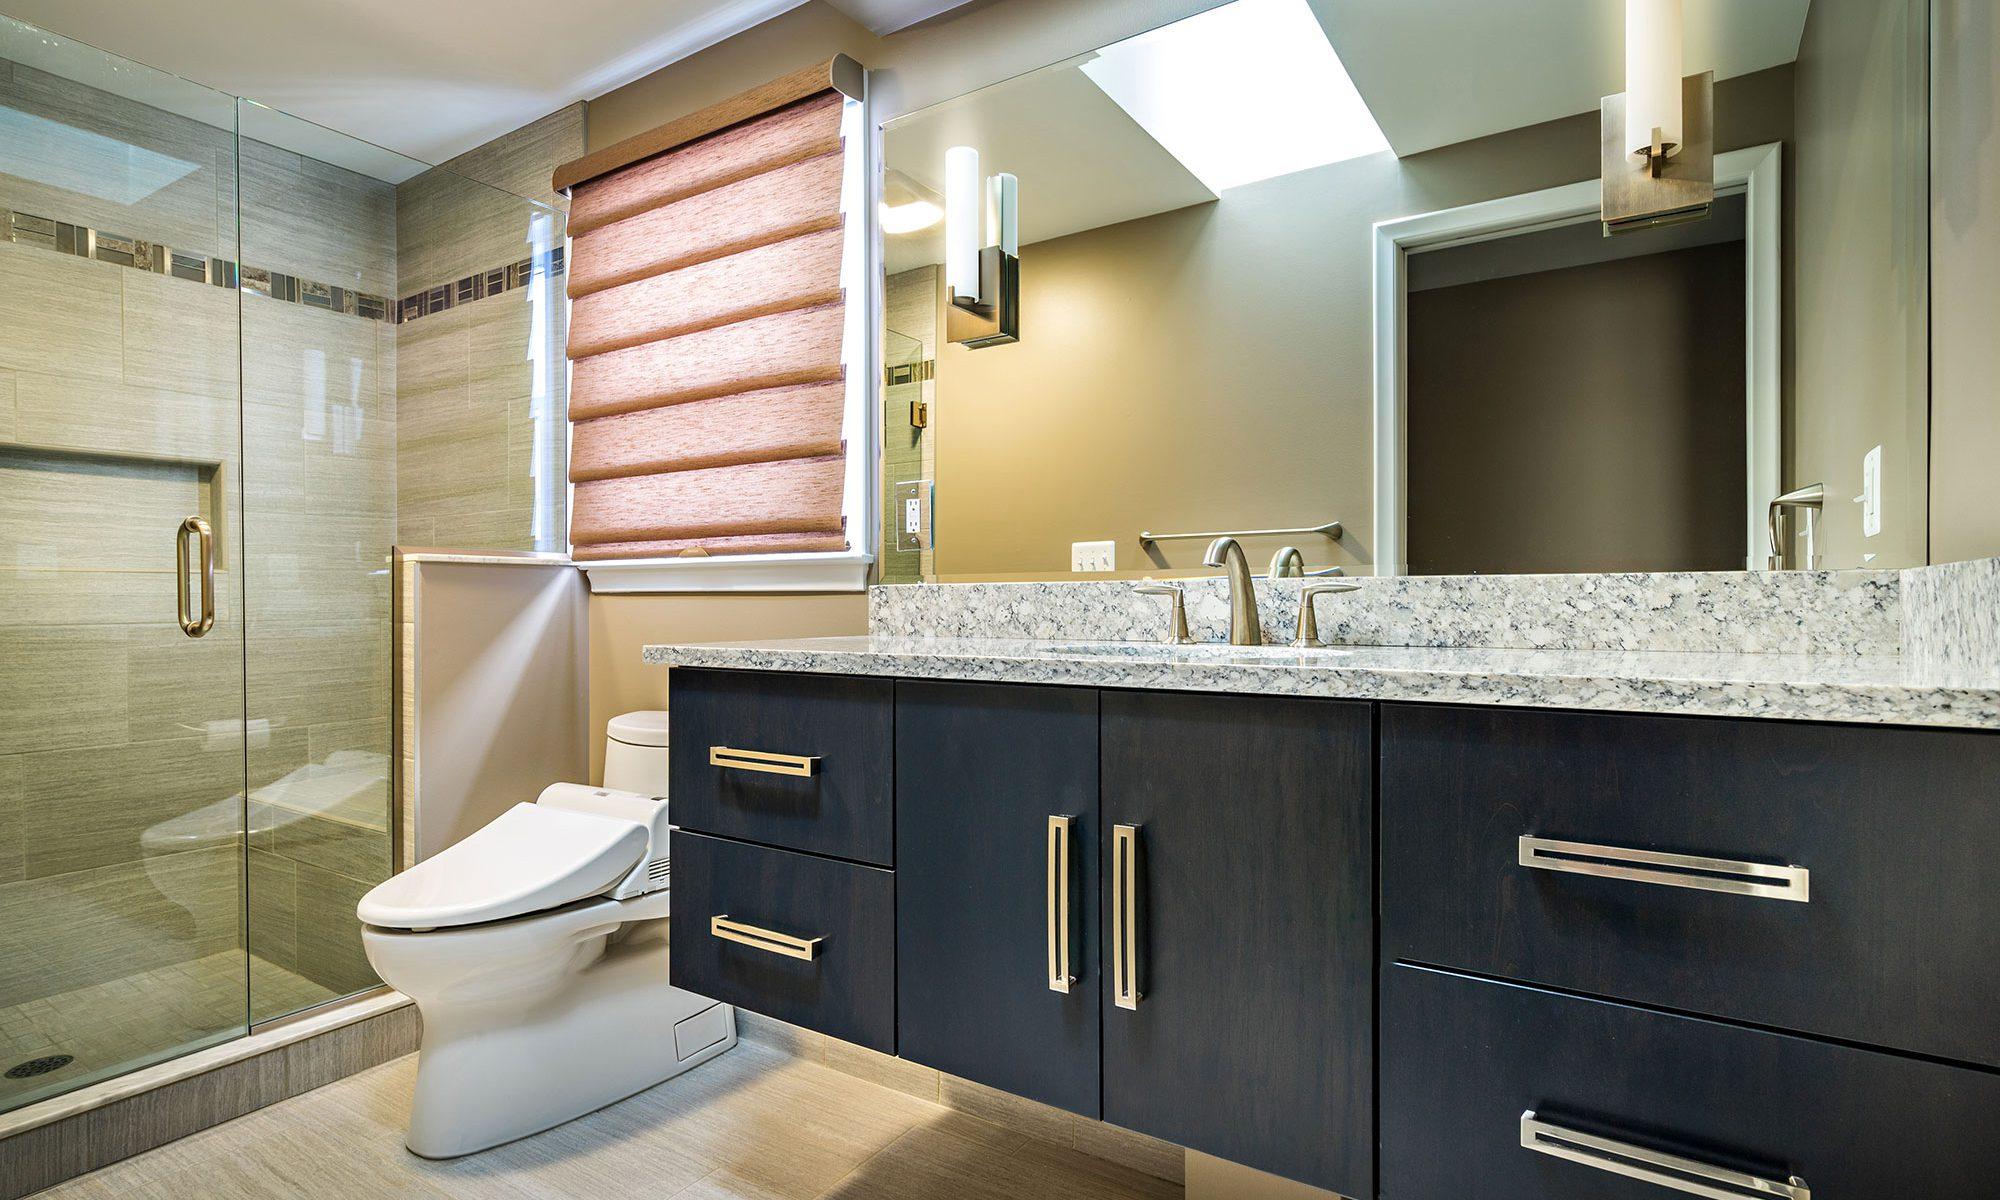 Washington Michigan Bathroom Remodel